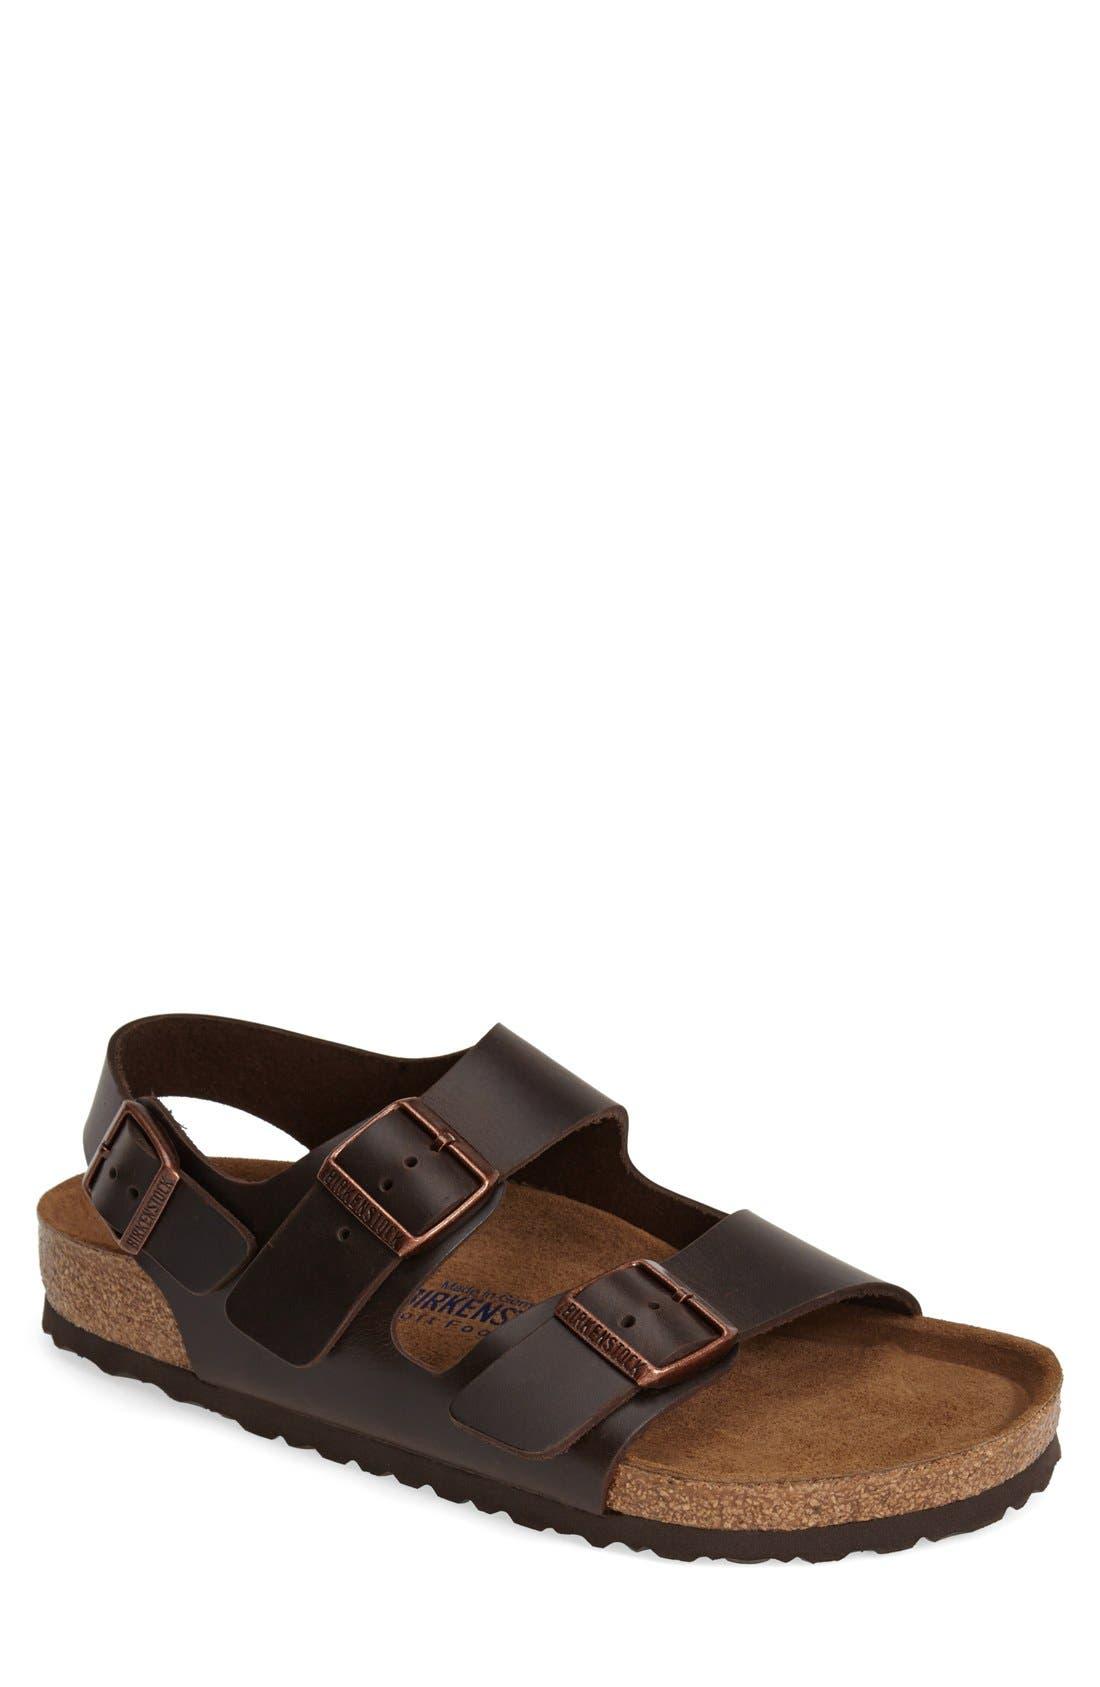 BIRKENSTOCK, 'Milano' Soft Footbed Sandal, Main thumbnail 1, color, AMALFI BROWN